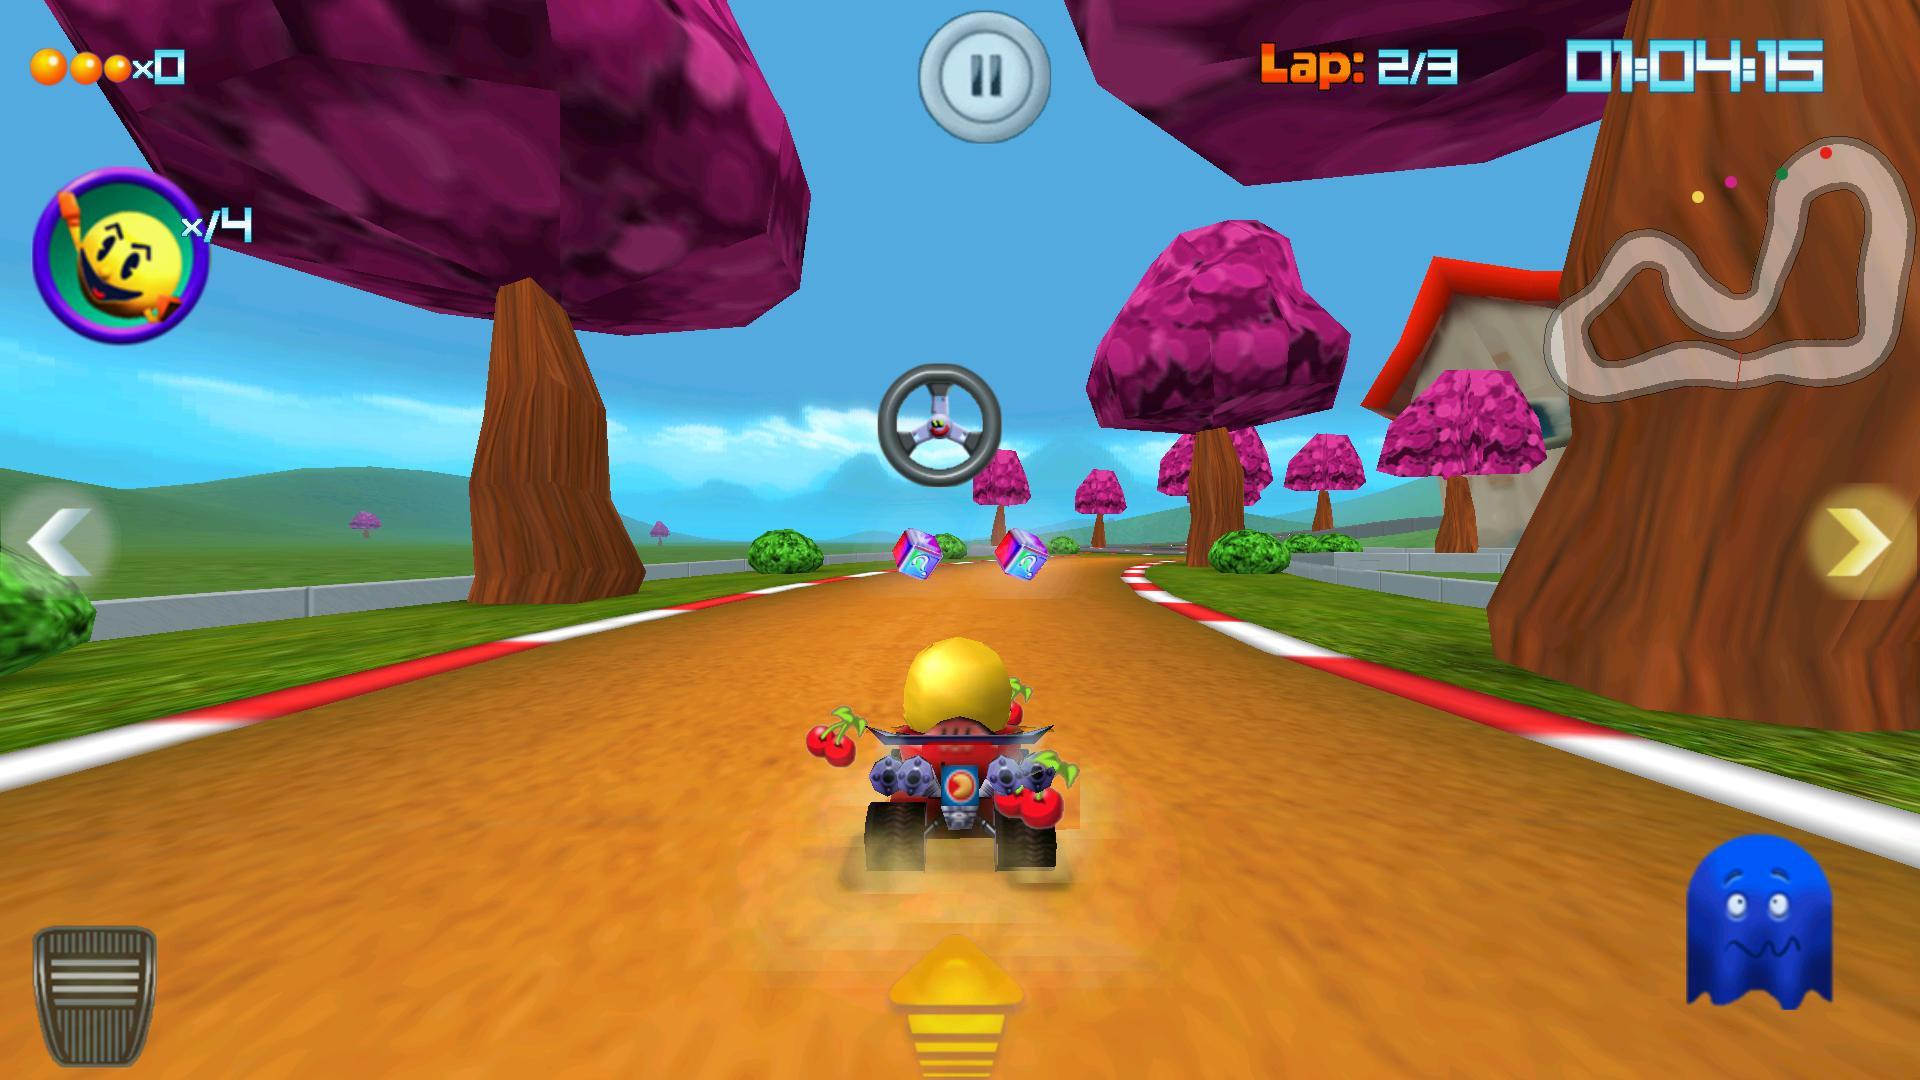 PAC-MAN Kart Rally by Namco (Fire TV): Amazon.com.au ...